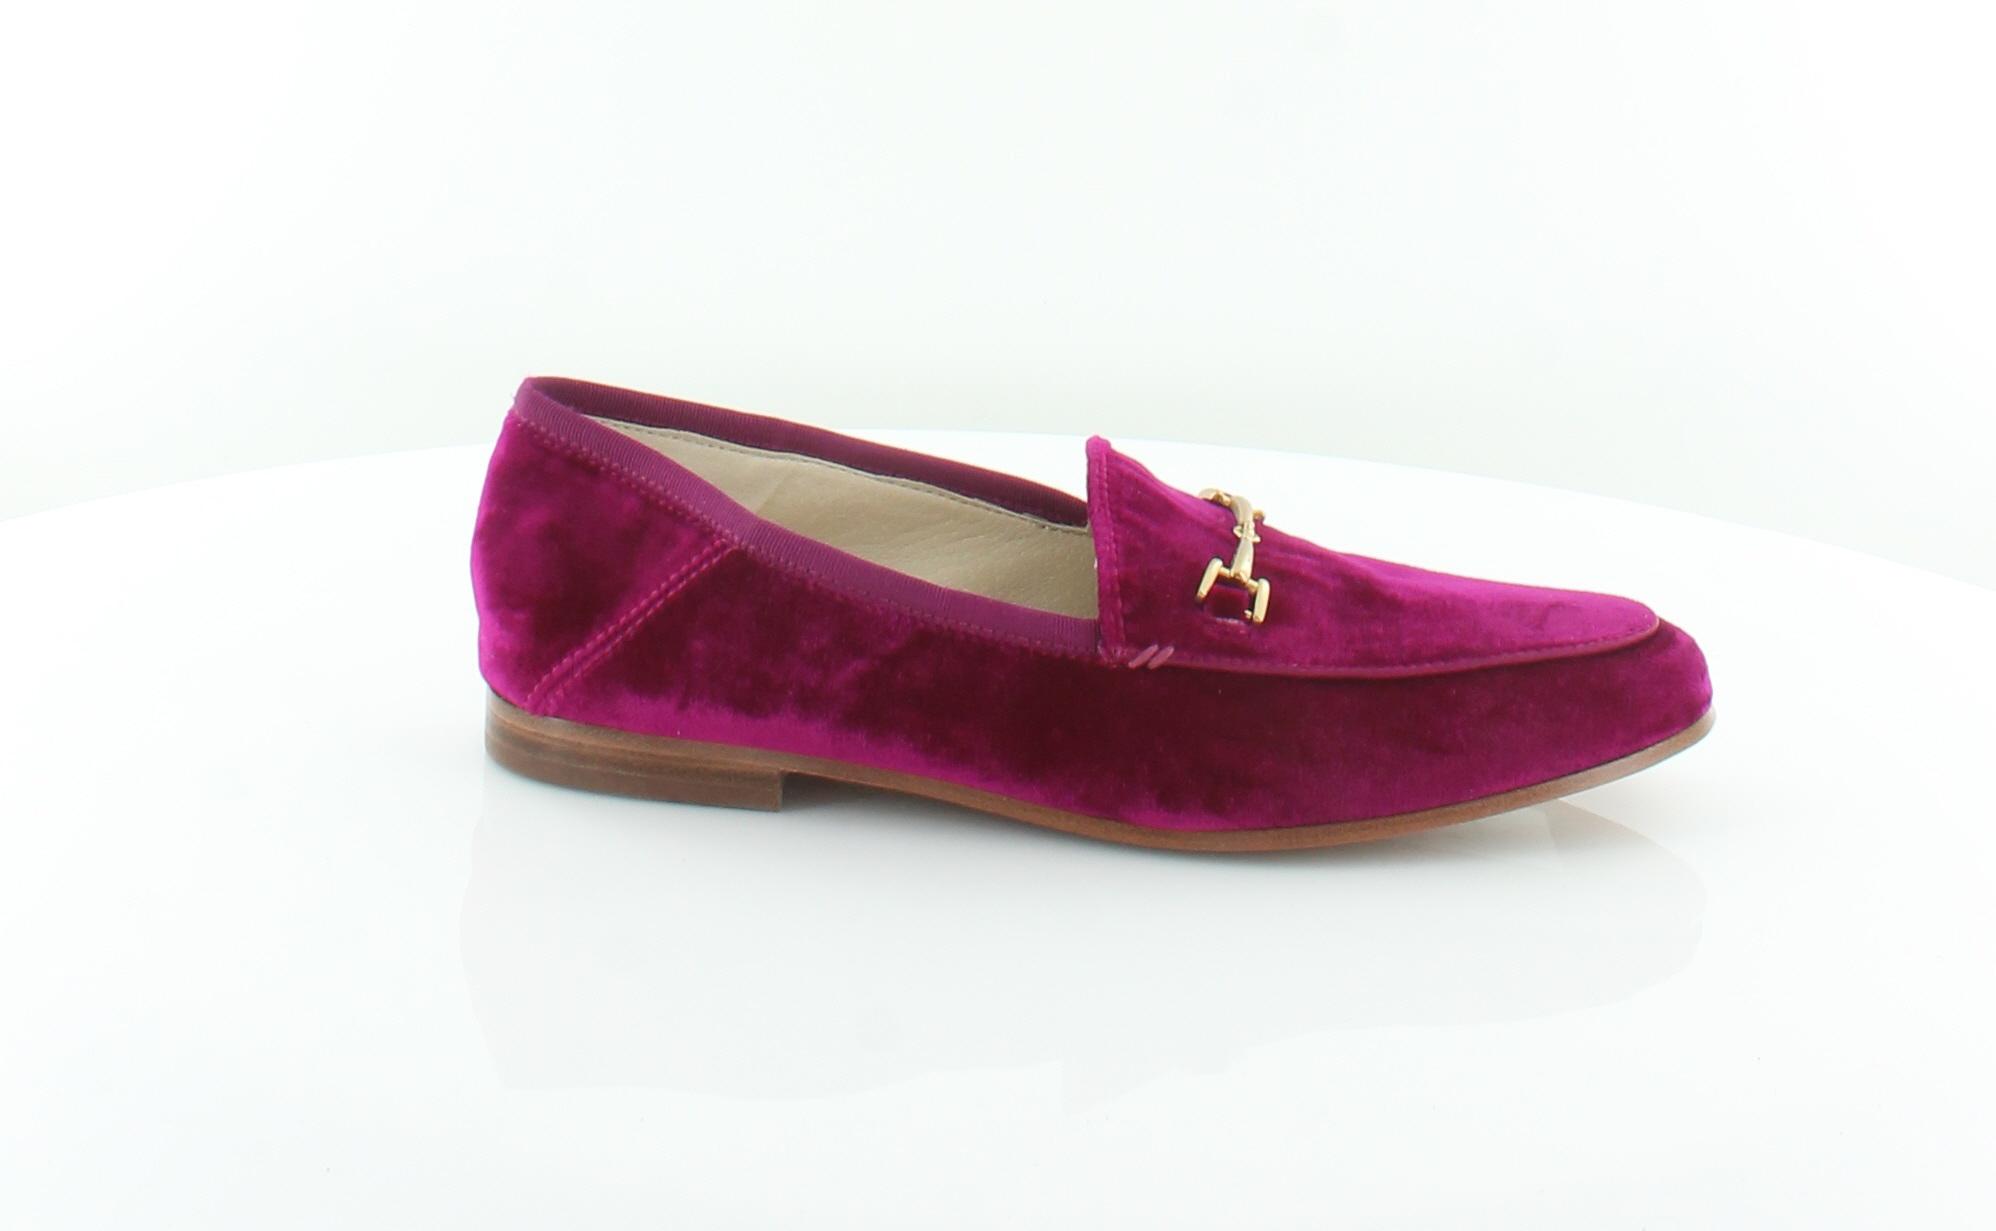 1ebd2878fb50 Sam Edelman Loraine Pink Womens Shoes Size 7 M Flats MSRP  140 ...